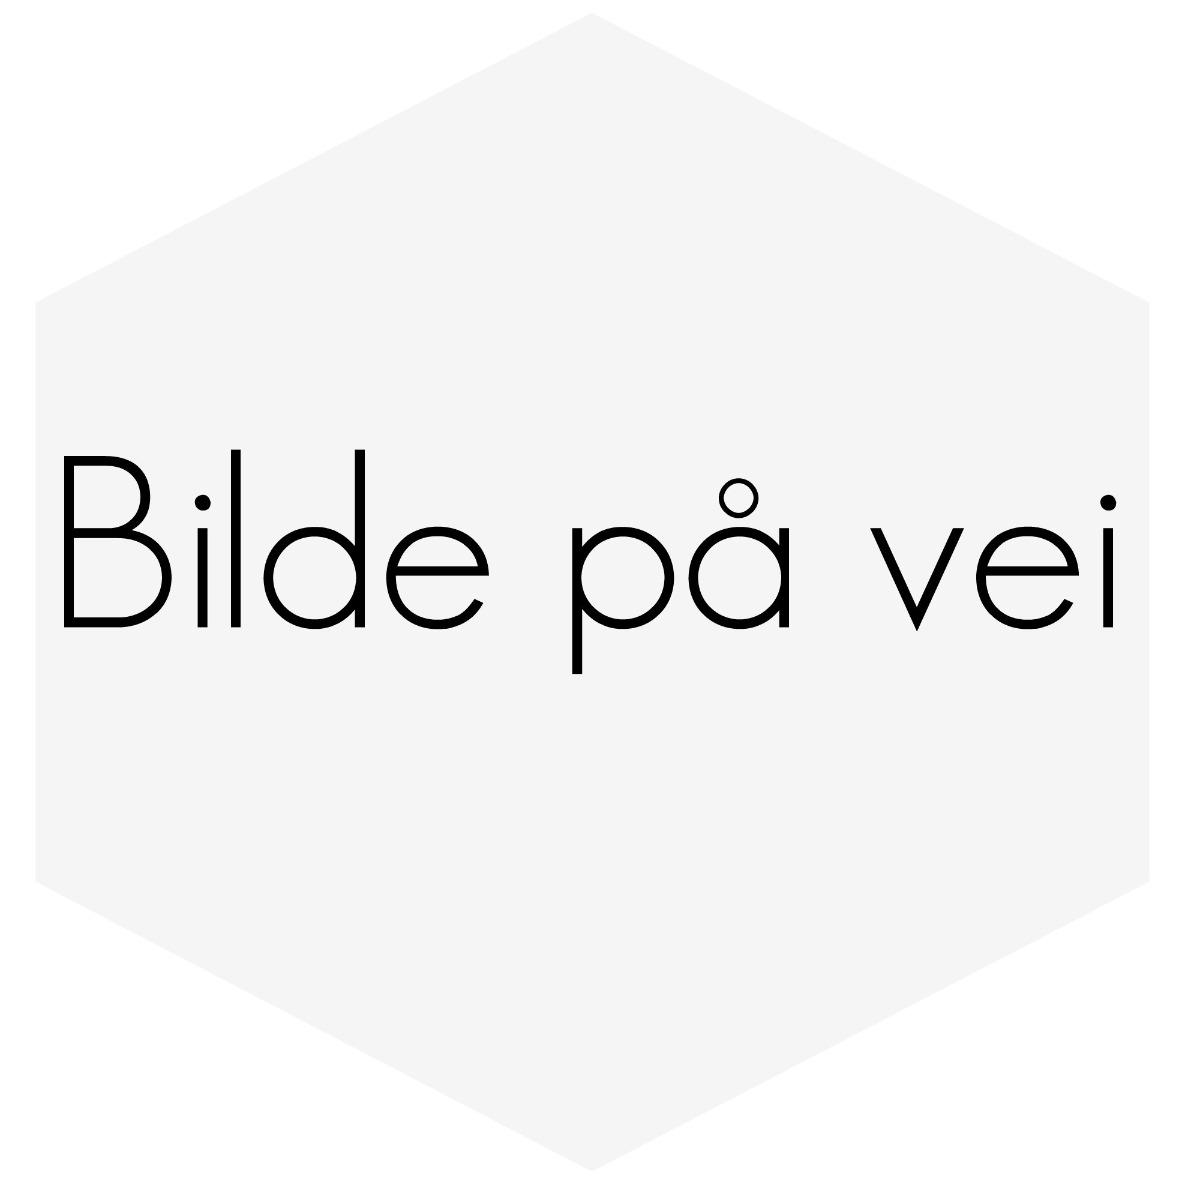 BAK SPOILER PÅ LOKK 740/760  SEDAN (4d) TYPE A. DEMOMOD.